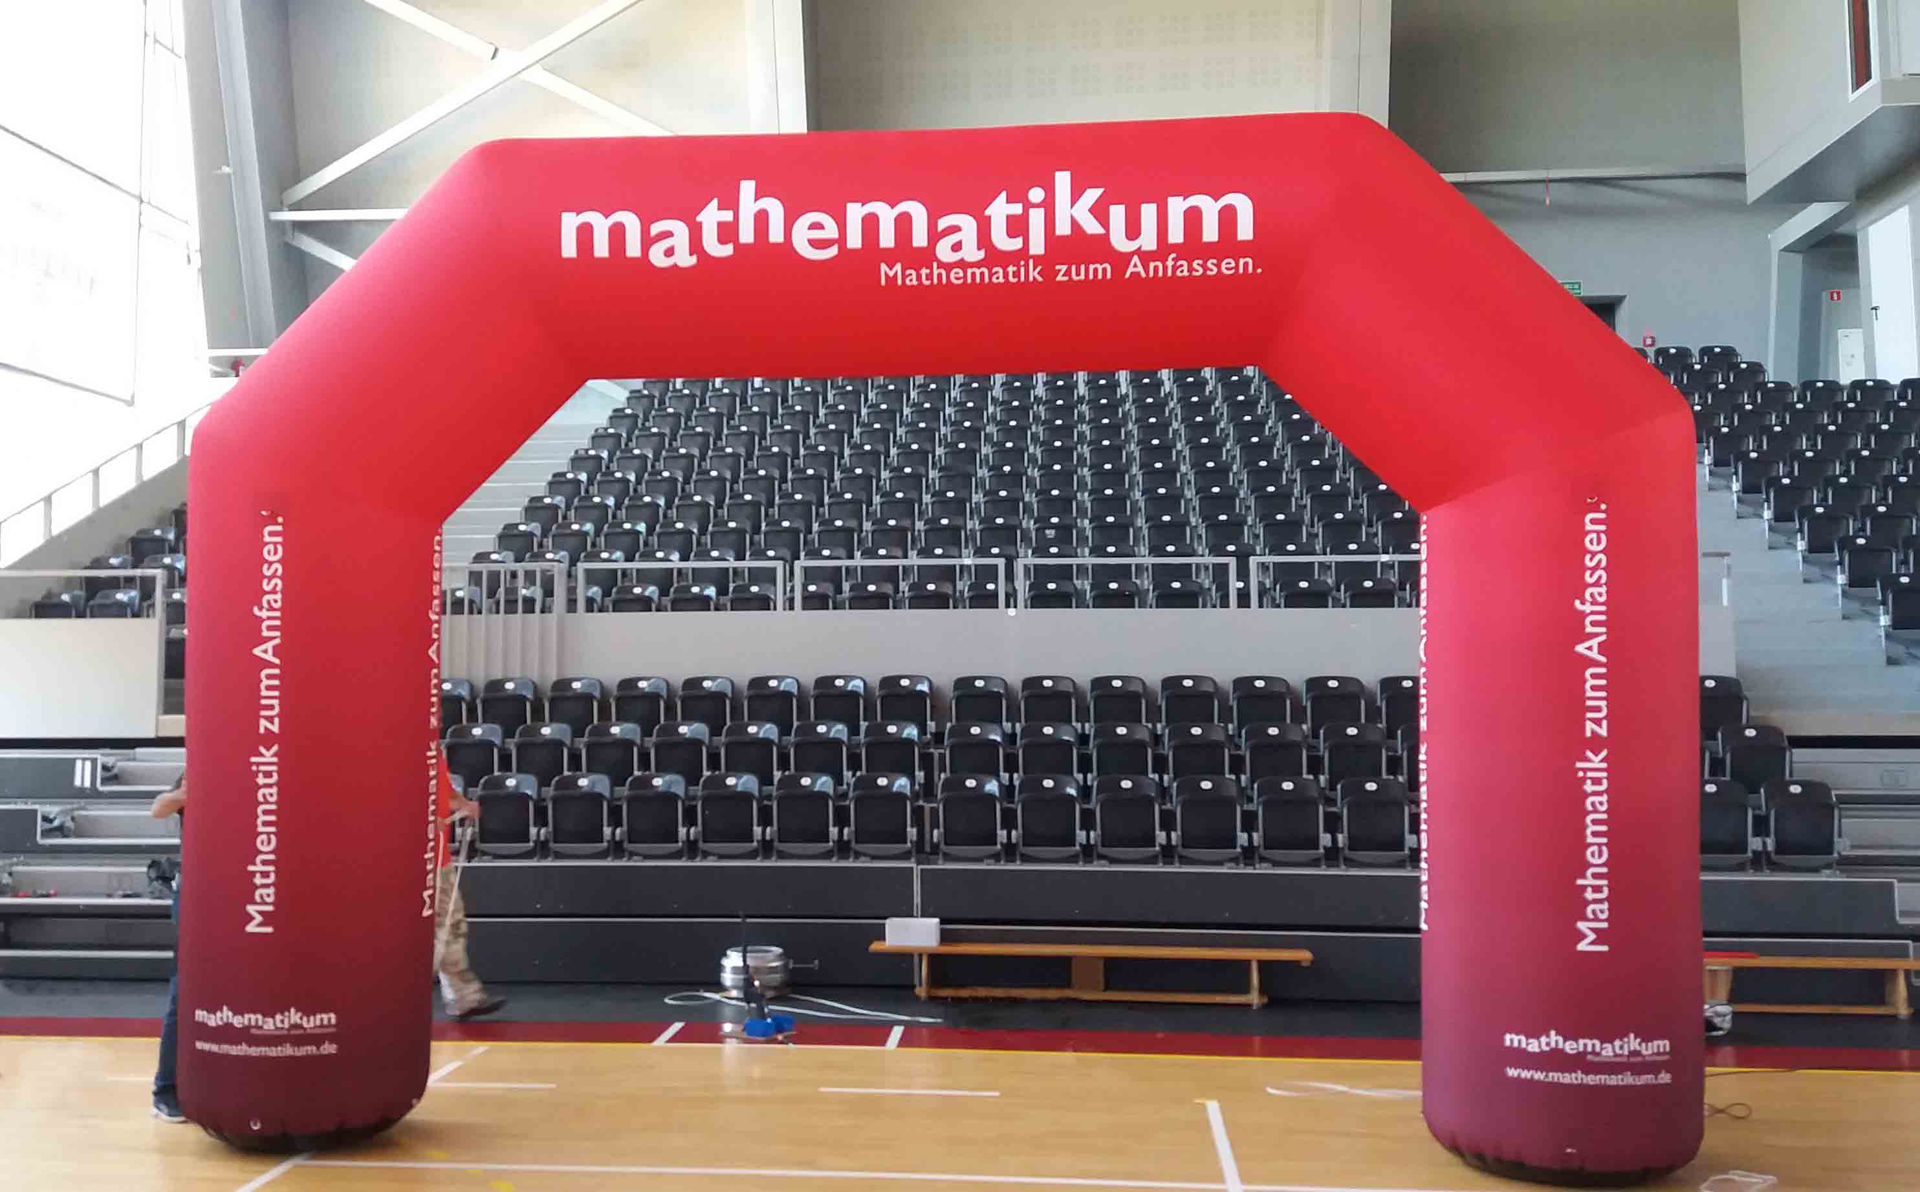 inflatable-mathematikum-archway